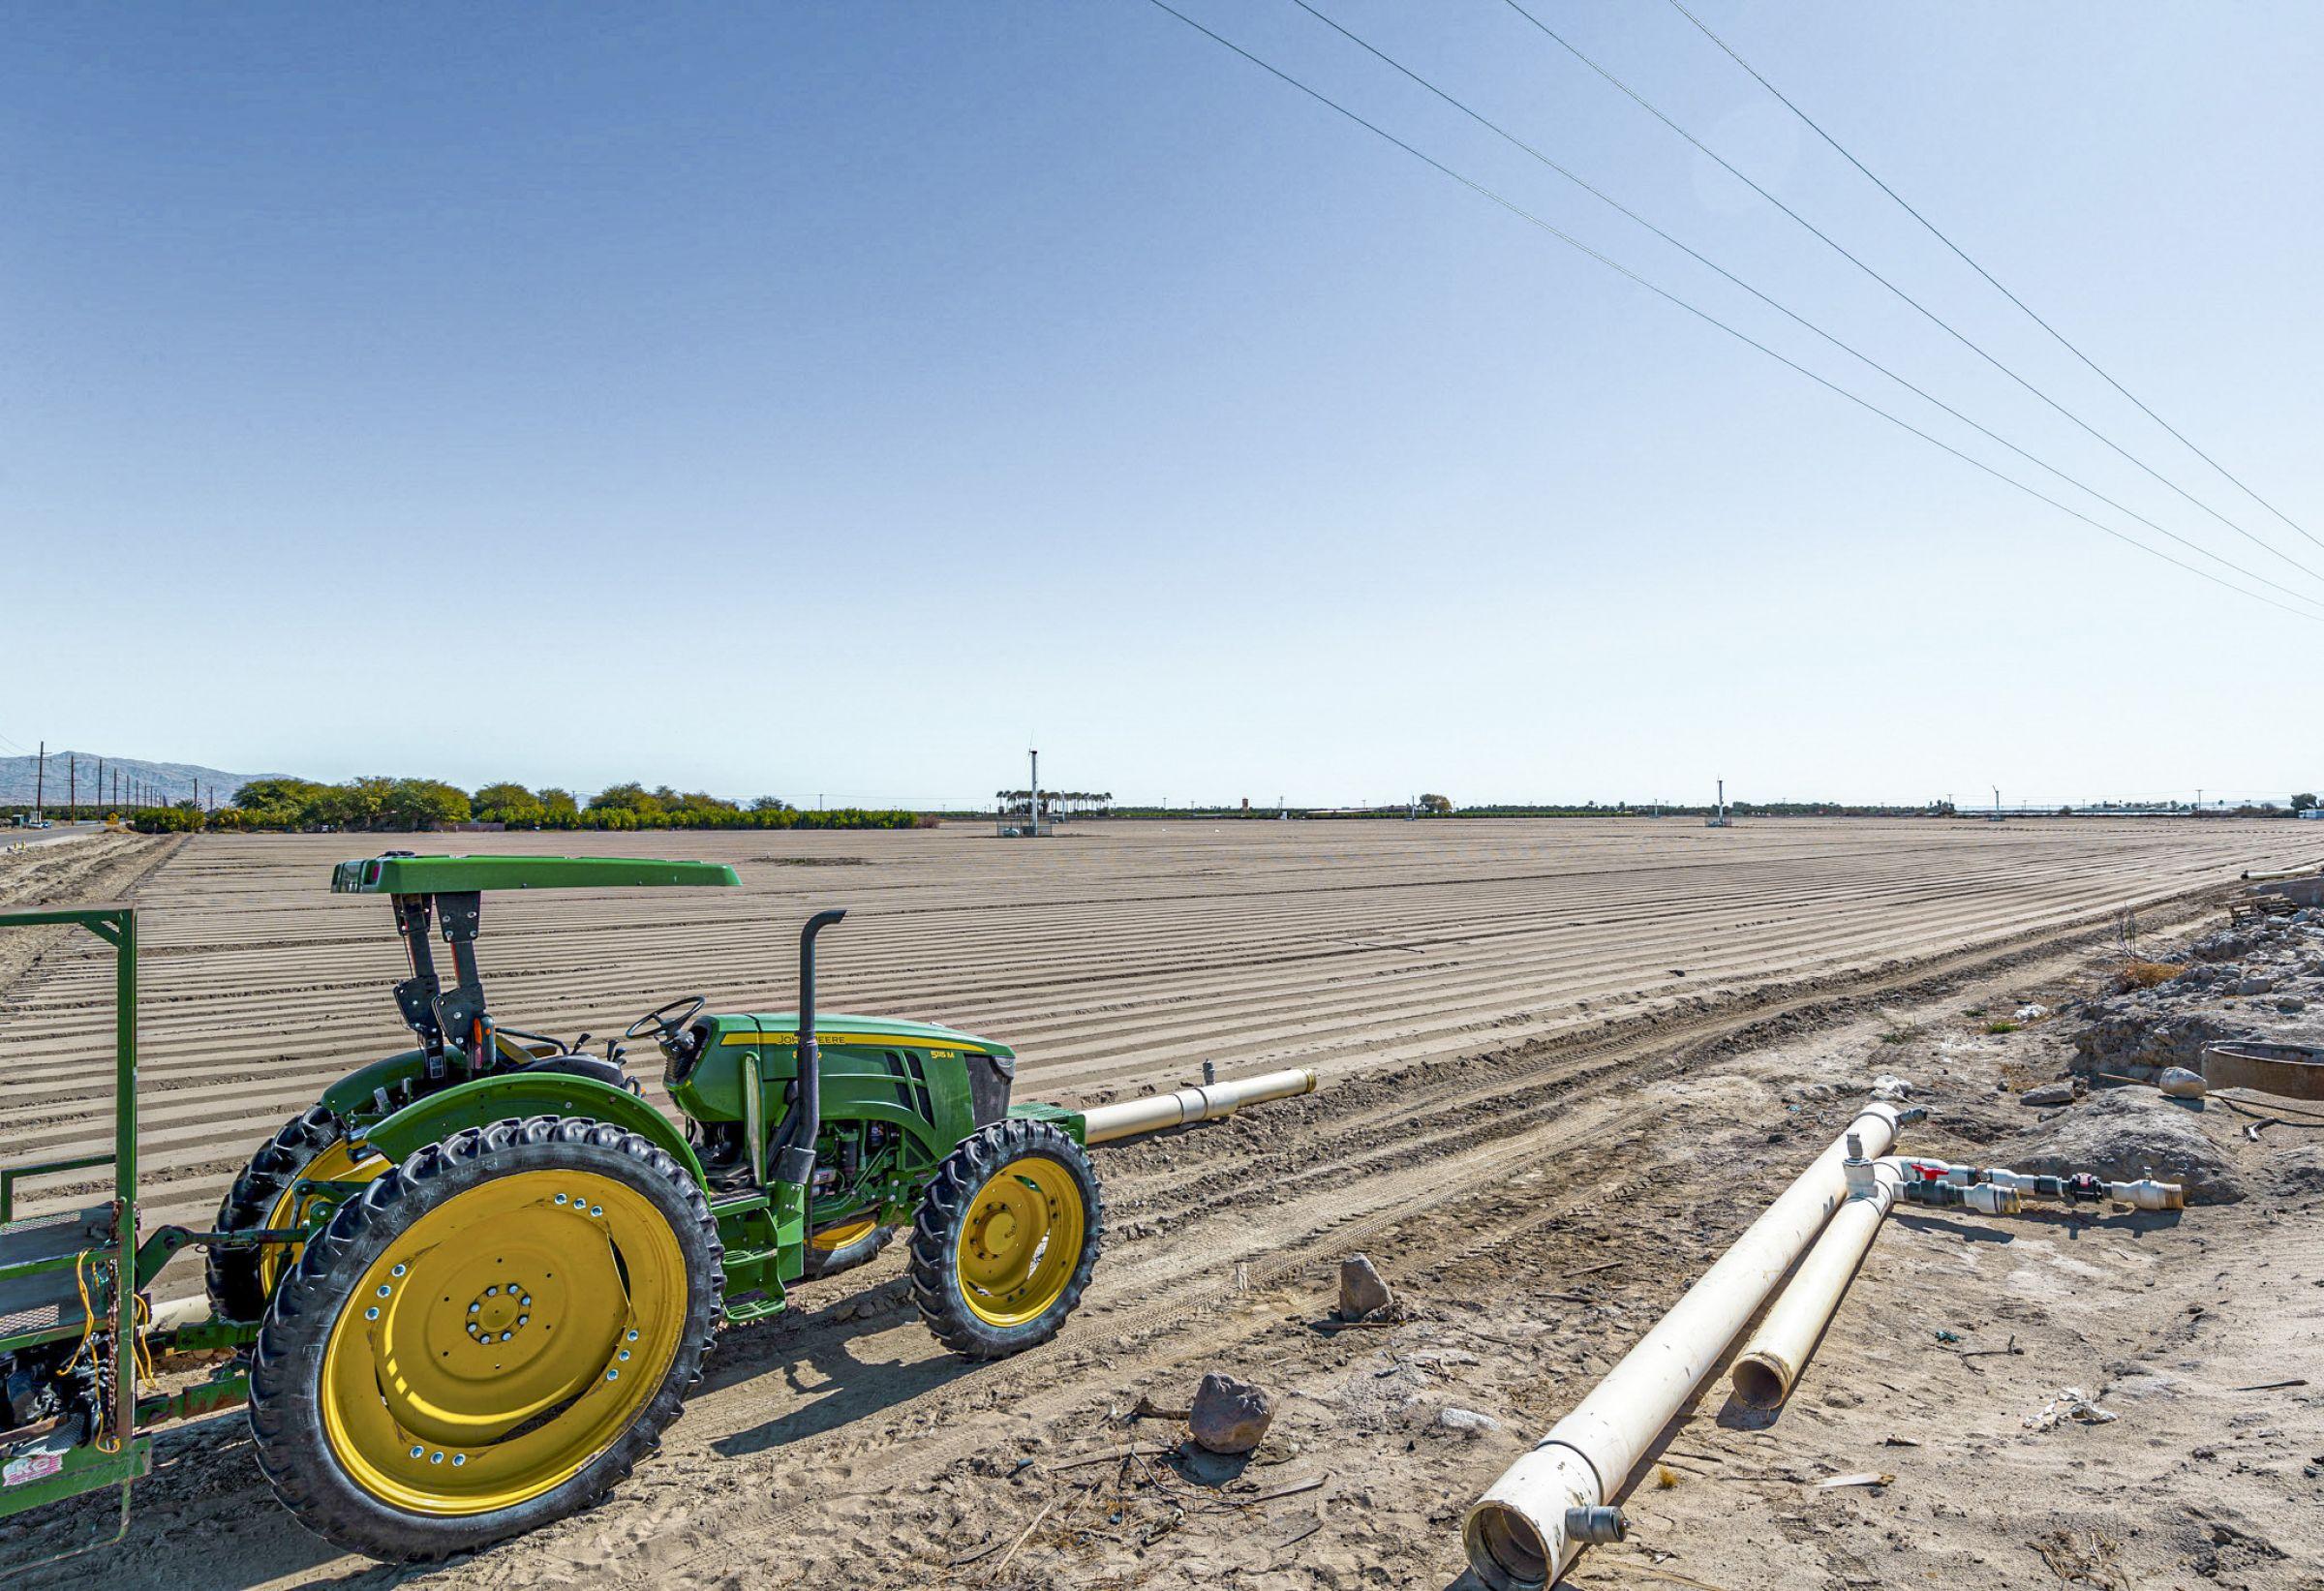 land-riverside-county-california-103-acres-listing-number-15585-0-2021-06-10-183433.jpg